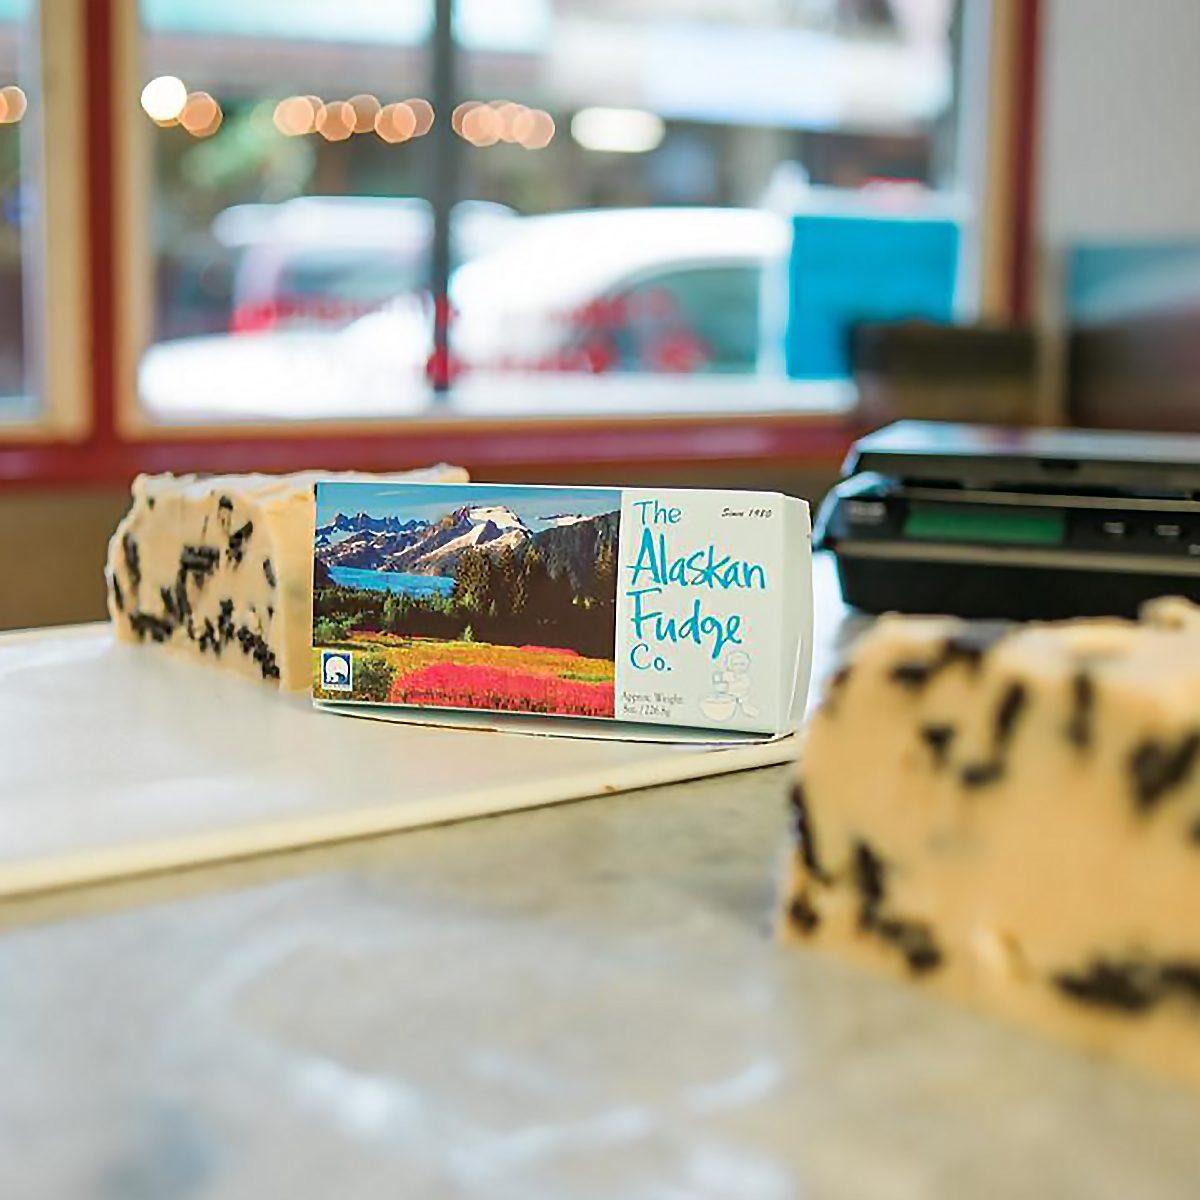 The Best Fudge Shop in Alaska - The Alaskan Fudge Co.